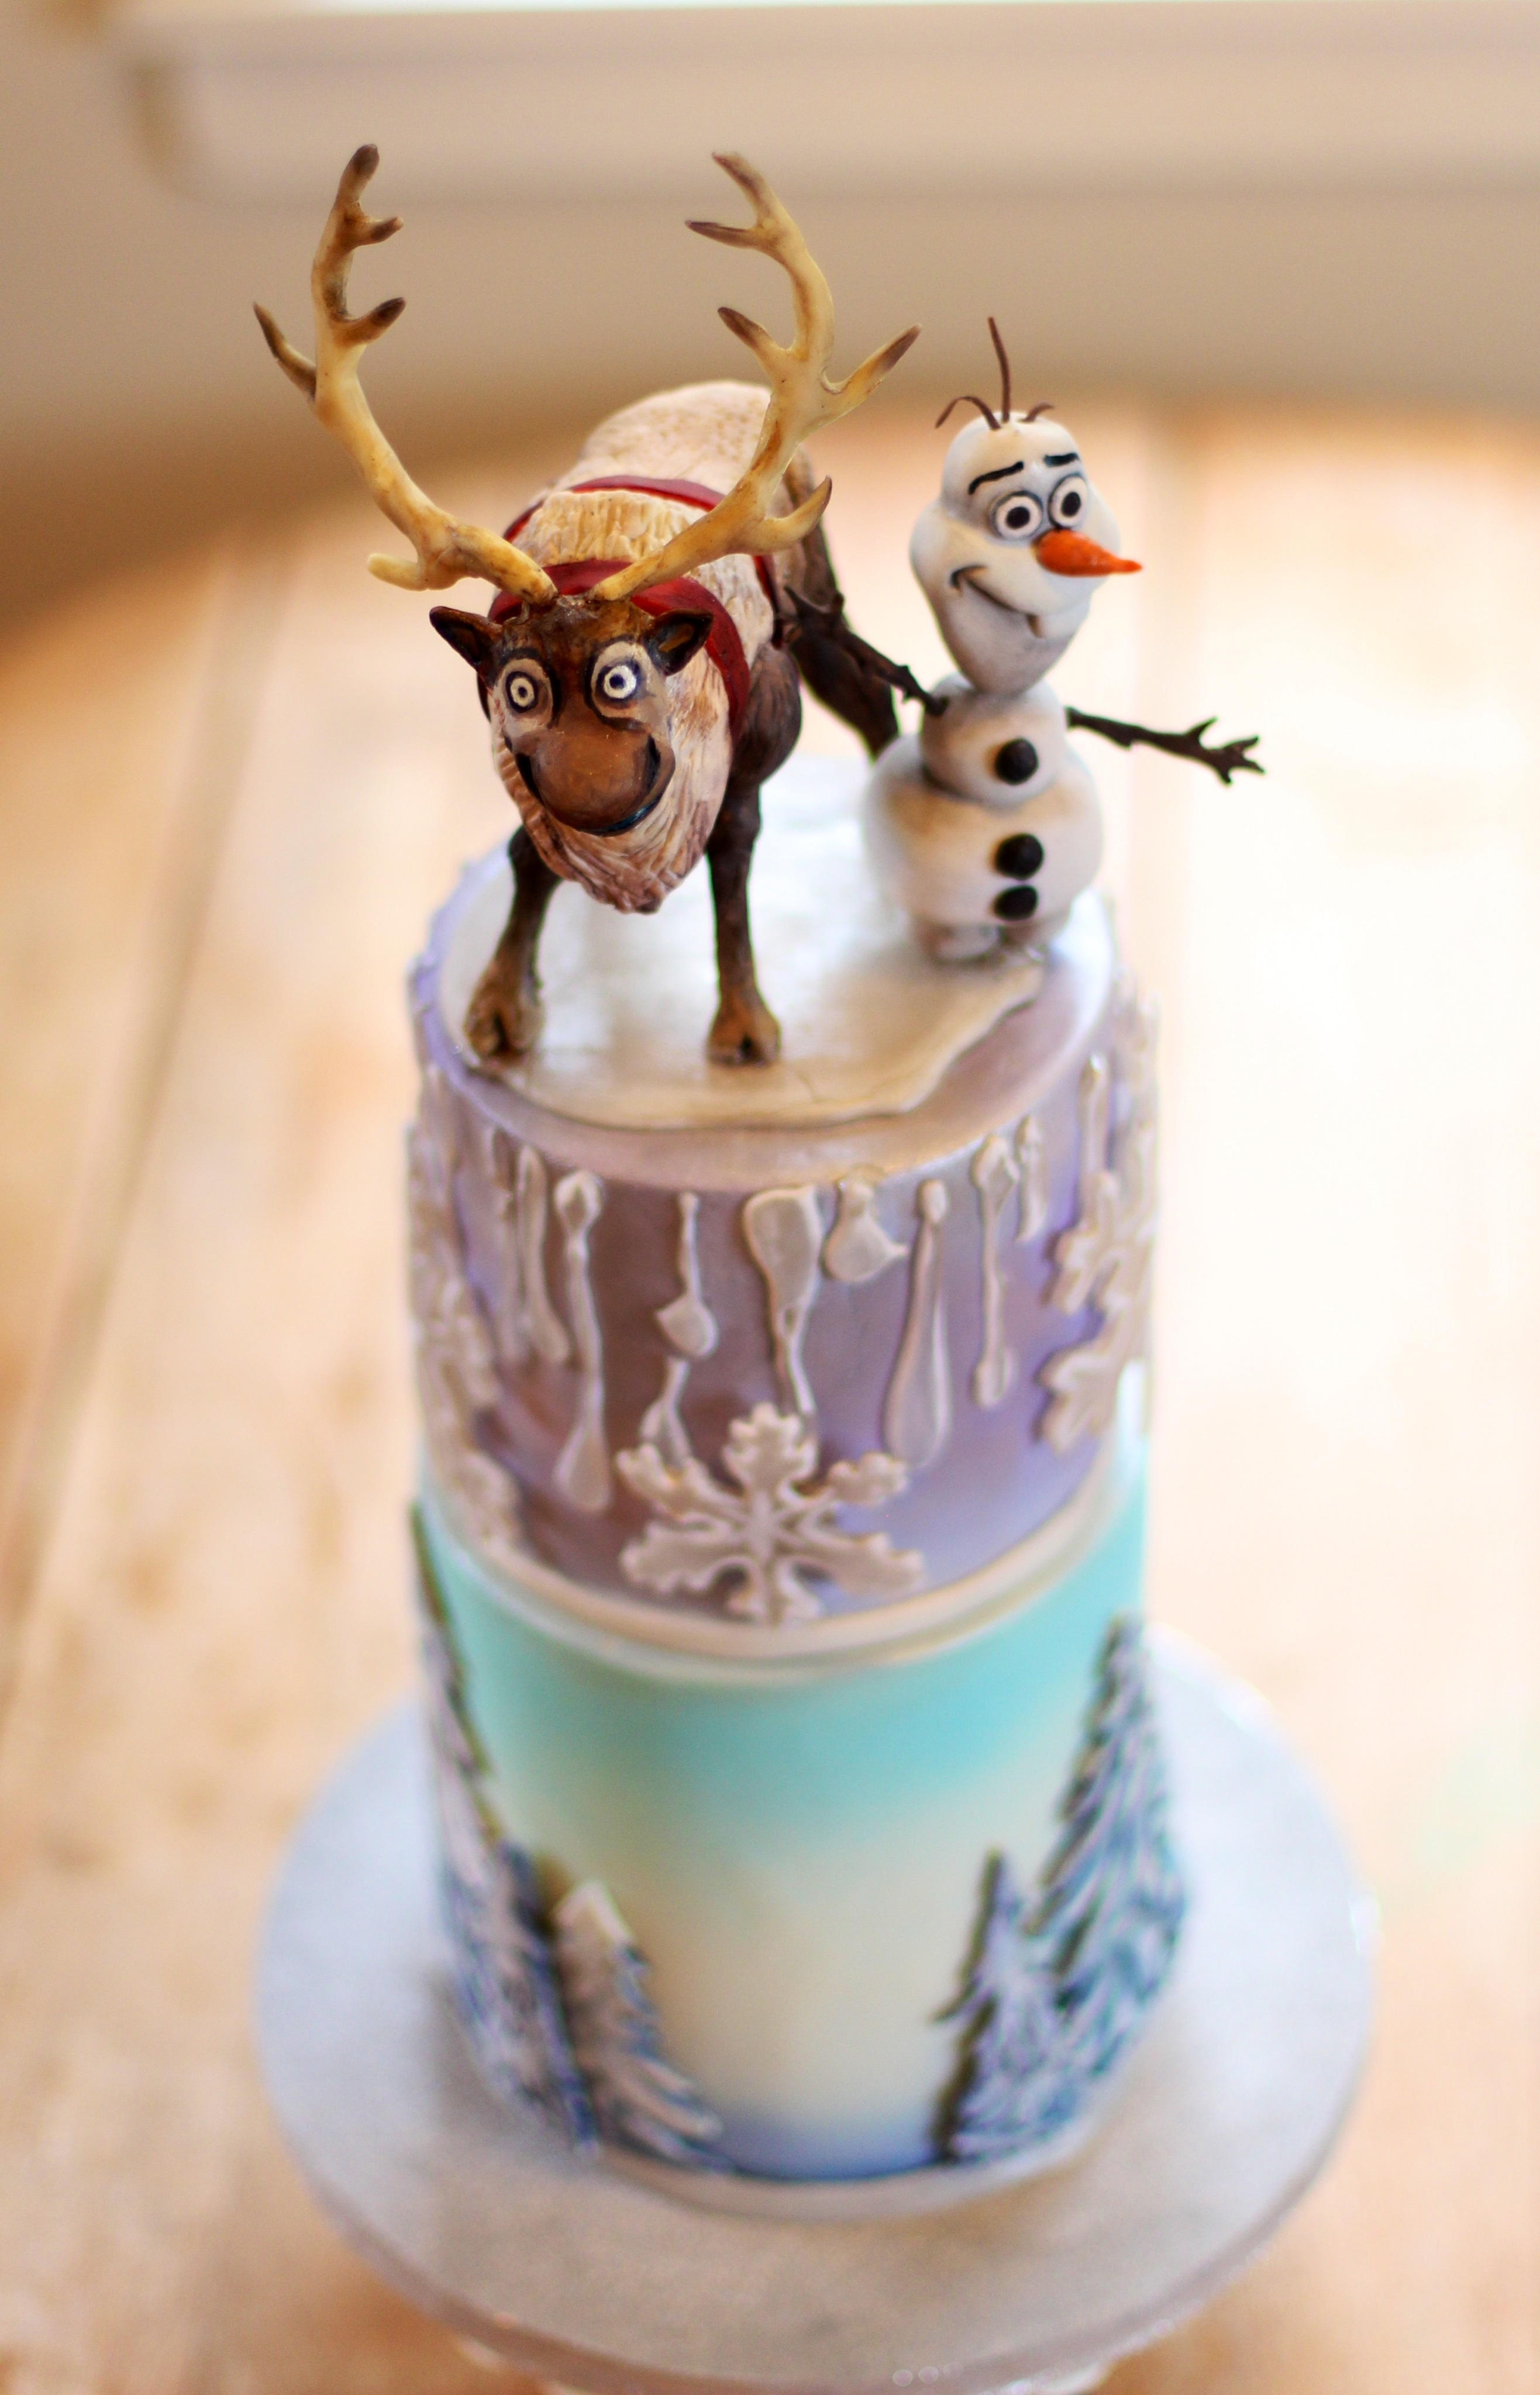 Disney Frozen Cake Modeling Chocolate Characters On Top Tier Sven ...